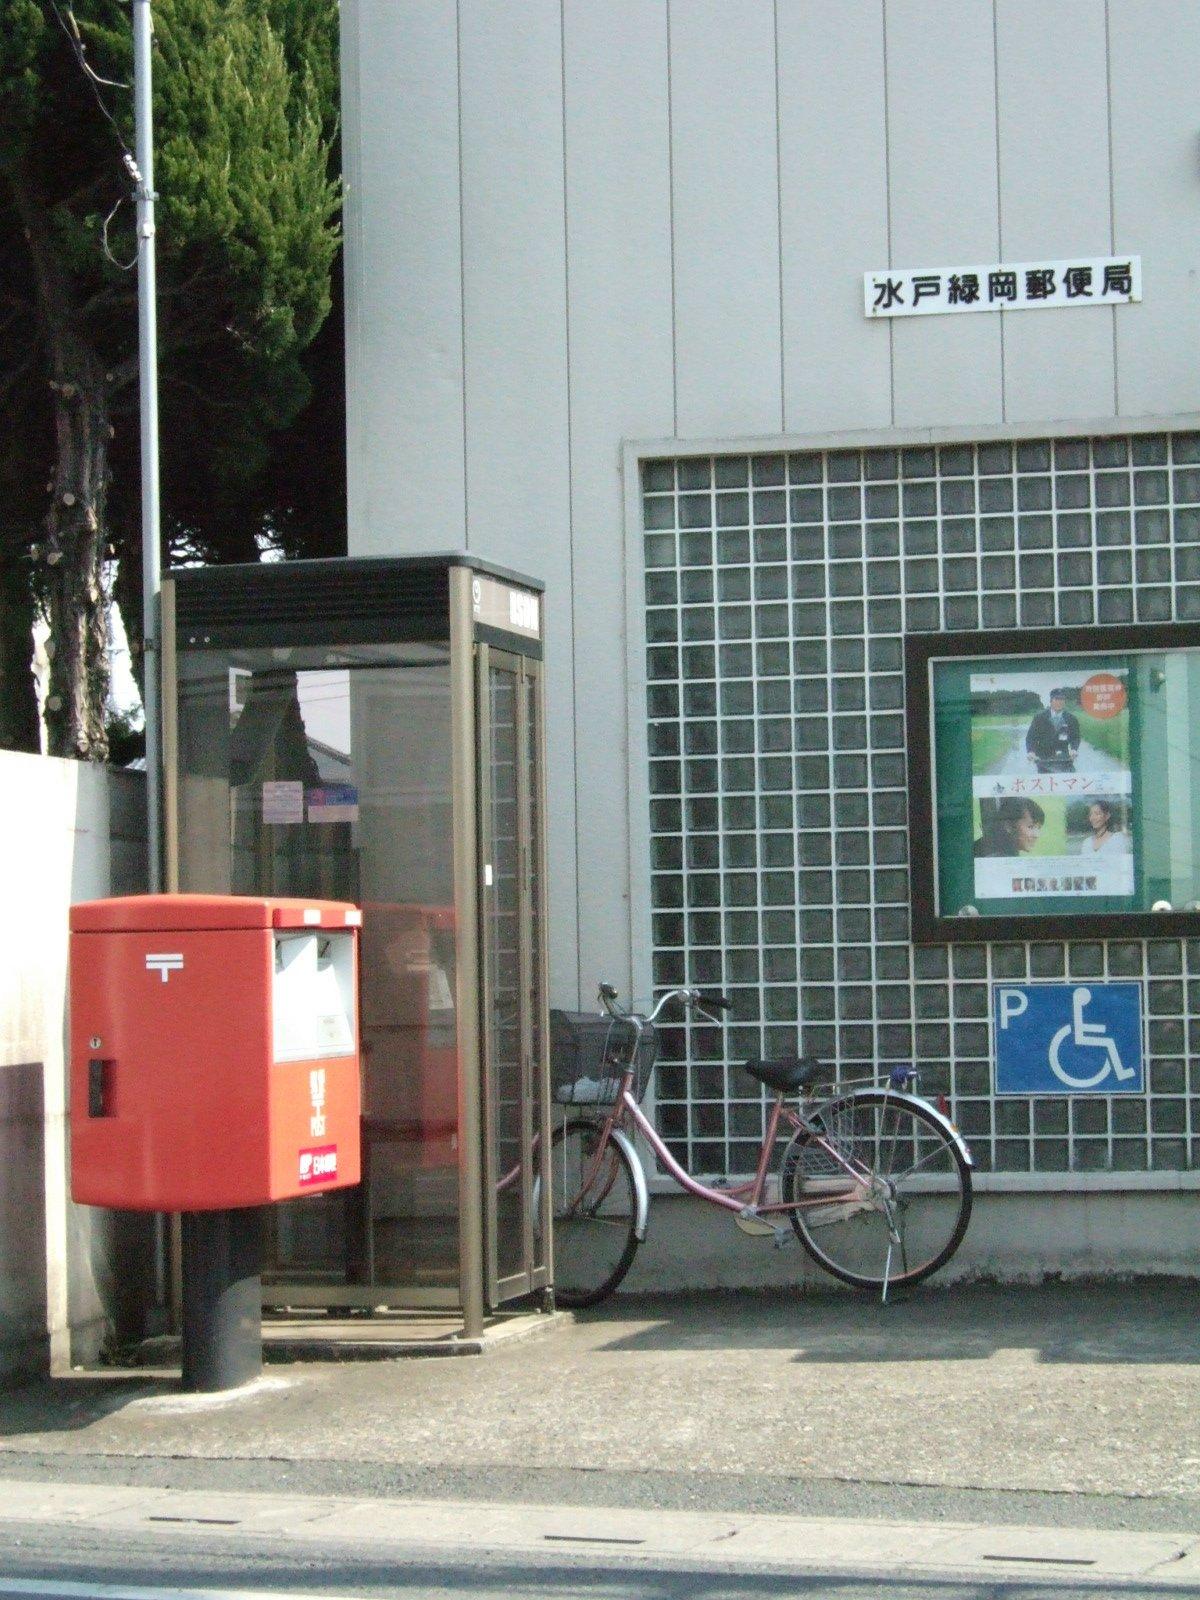 ポスト写真 : 水戸緑岡郵便局の前 : 茨城トヨタ駐車場 : 茨城県水戸市千波町1881